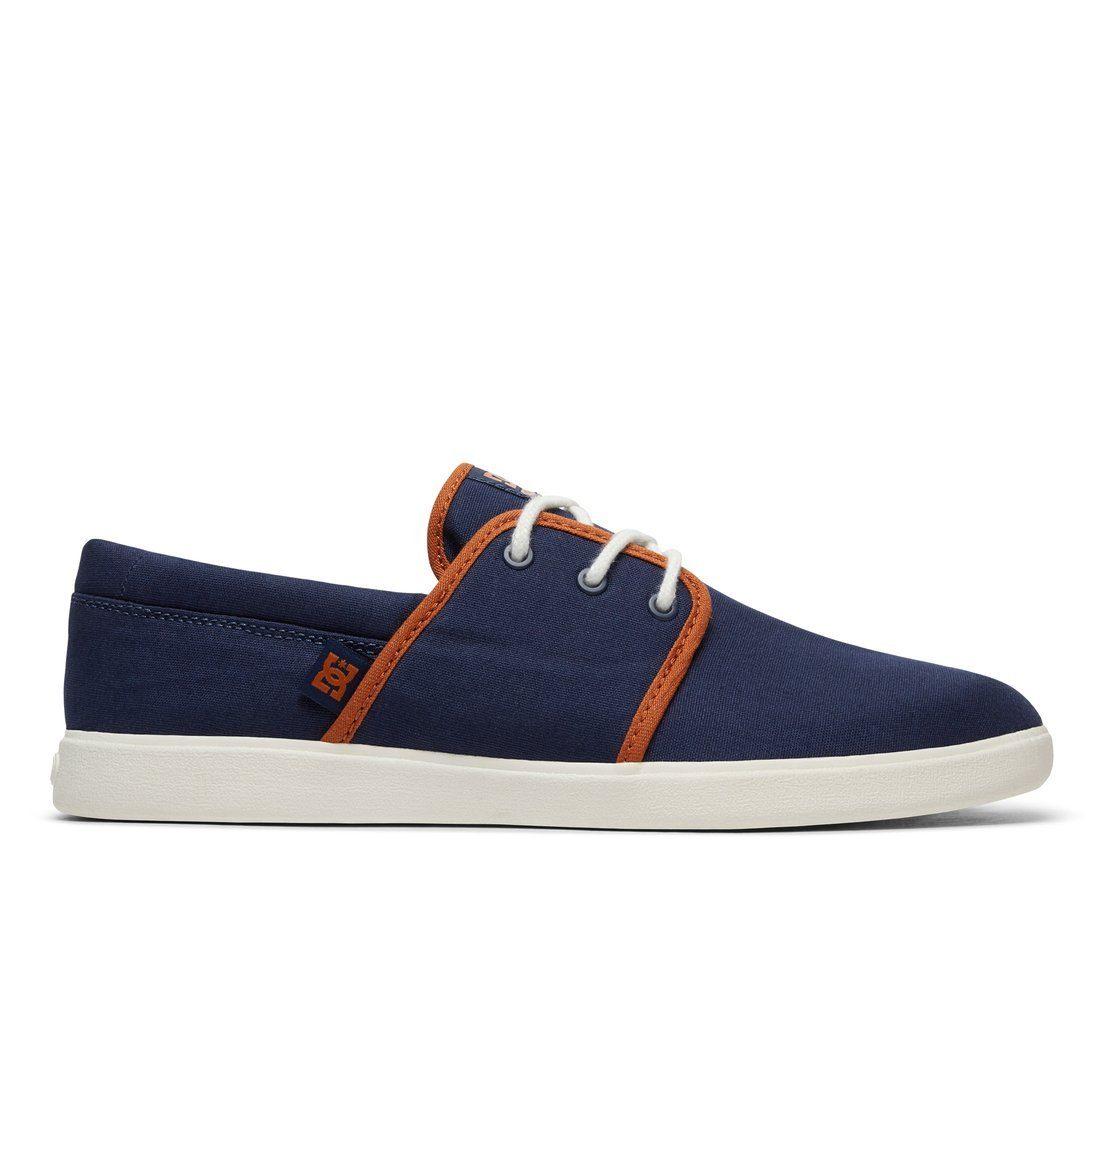 DC Shoes Schuhe Haven online kaufen  Navy#ft5_slash#dk chocolate